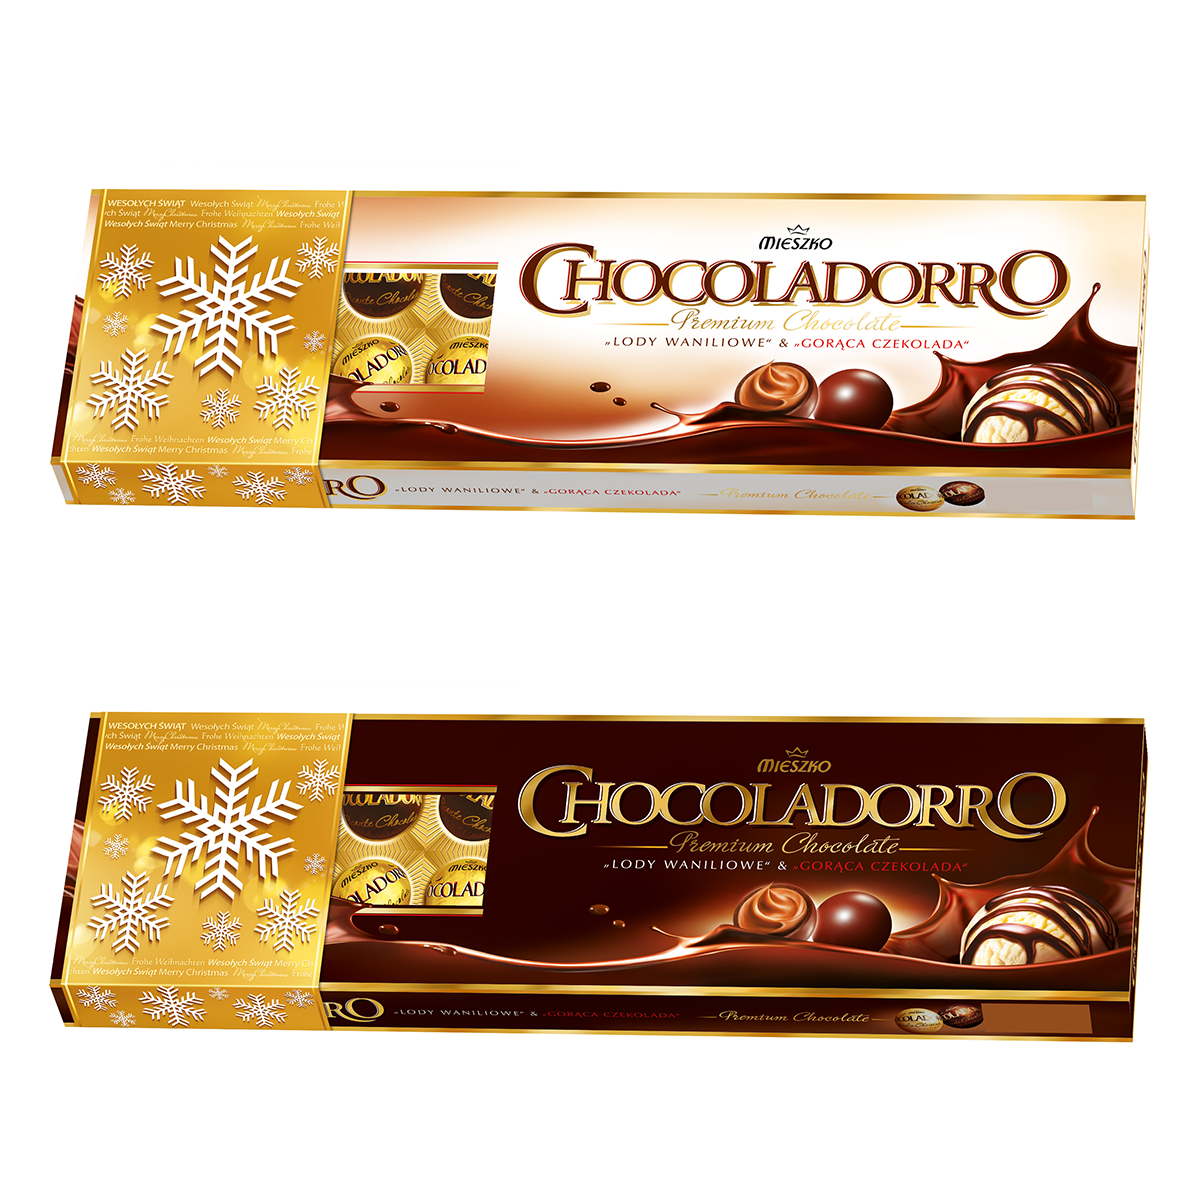 2020_09_02_chocoladorro_7